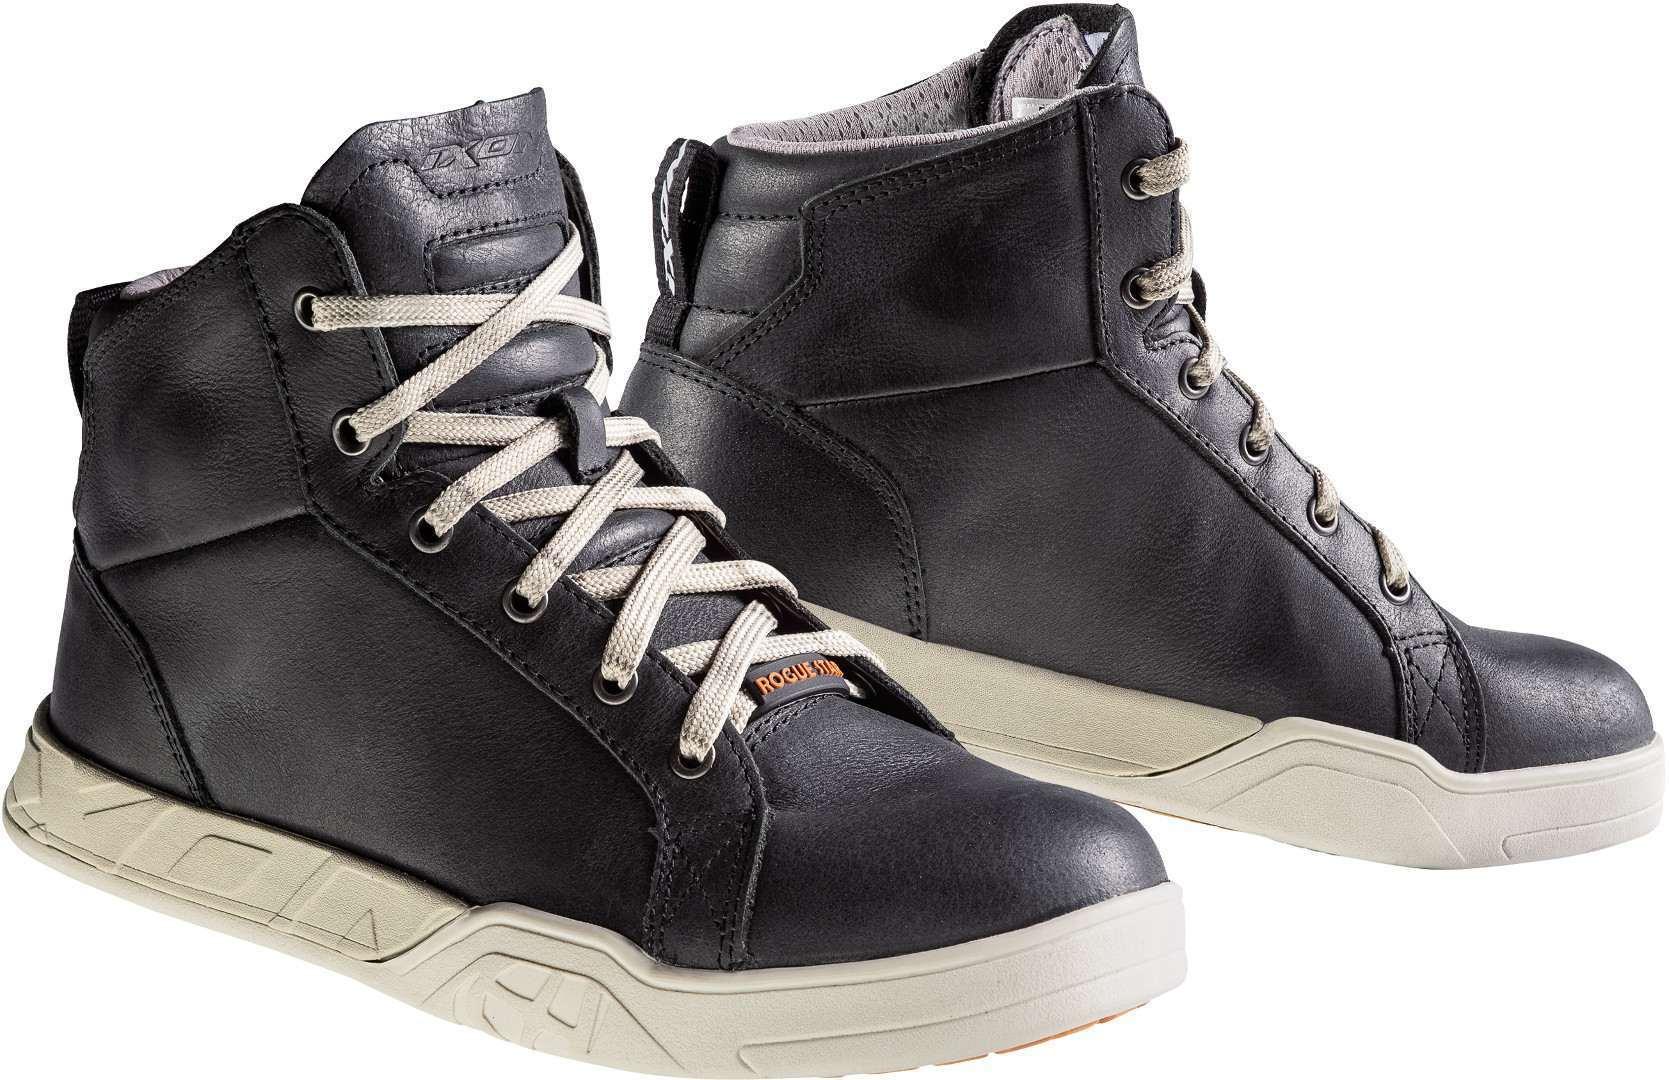 Ixon Rogue Star L Ladies Motorcycle Shoes Black 38